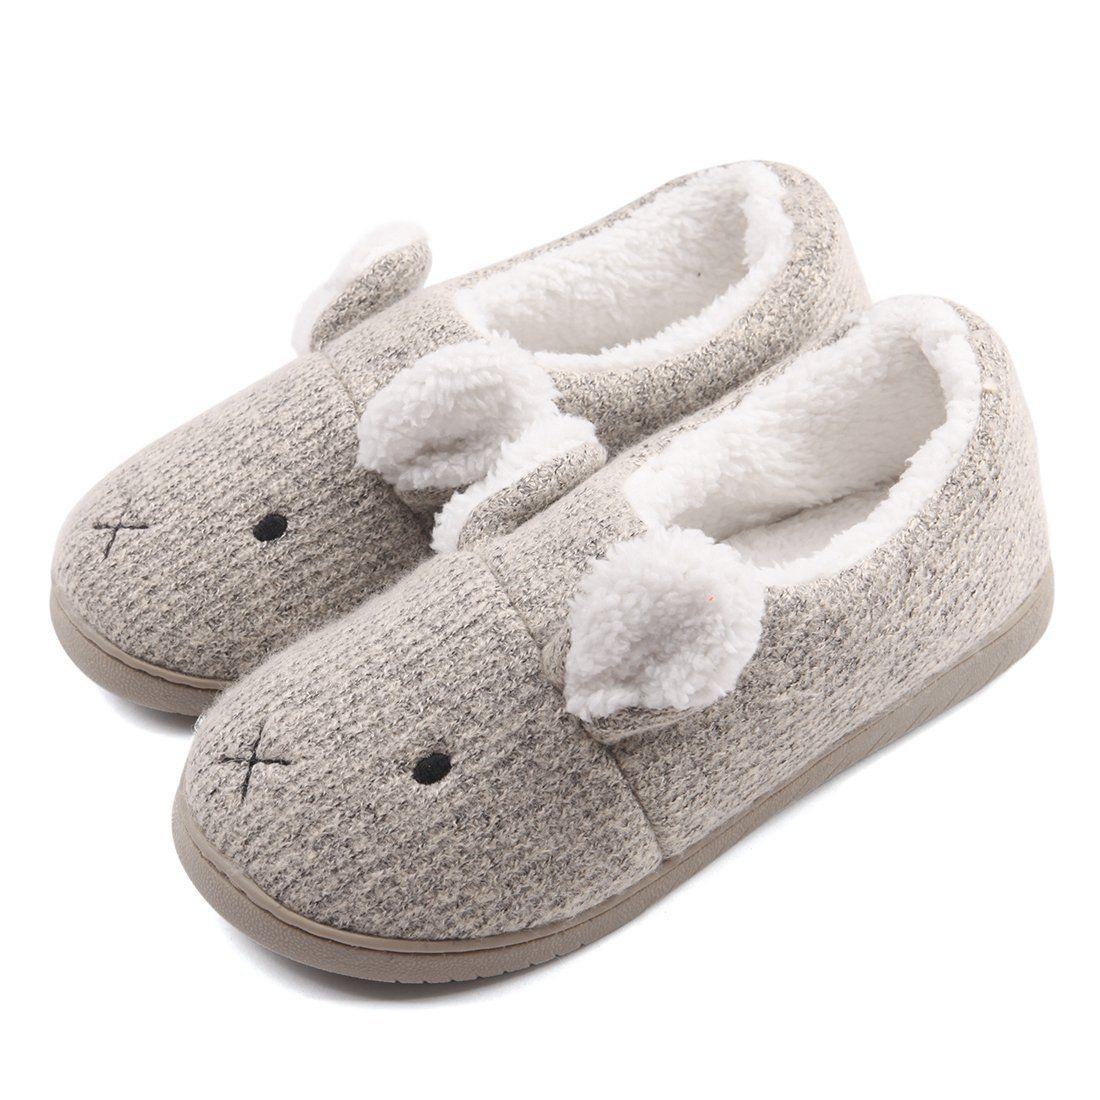 Amazon Com Neeseelily Women Comfort Plush Cozy Home Slippers Animal Non Slip Indoor Shoes Slippers Animal Slippers Indoor Shoes Slippers House Slippers